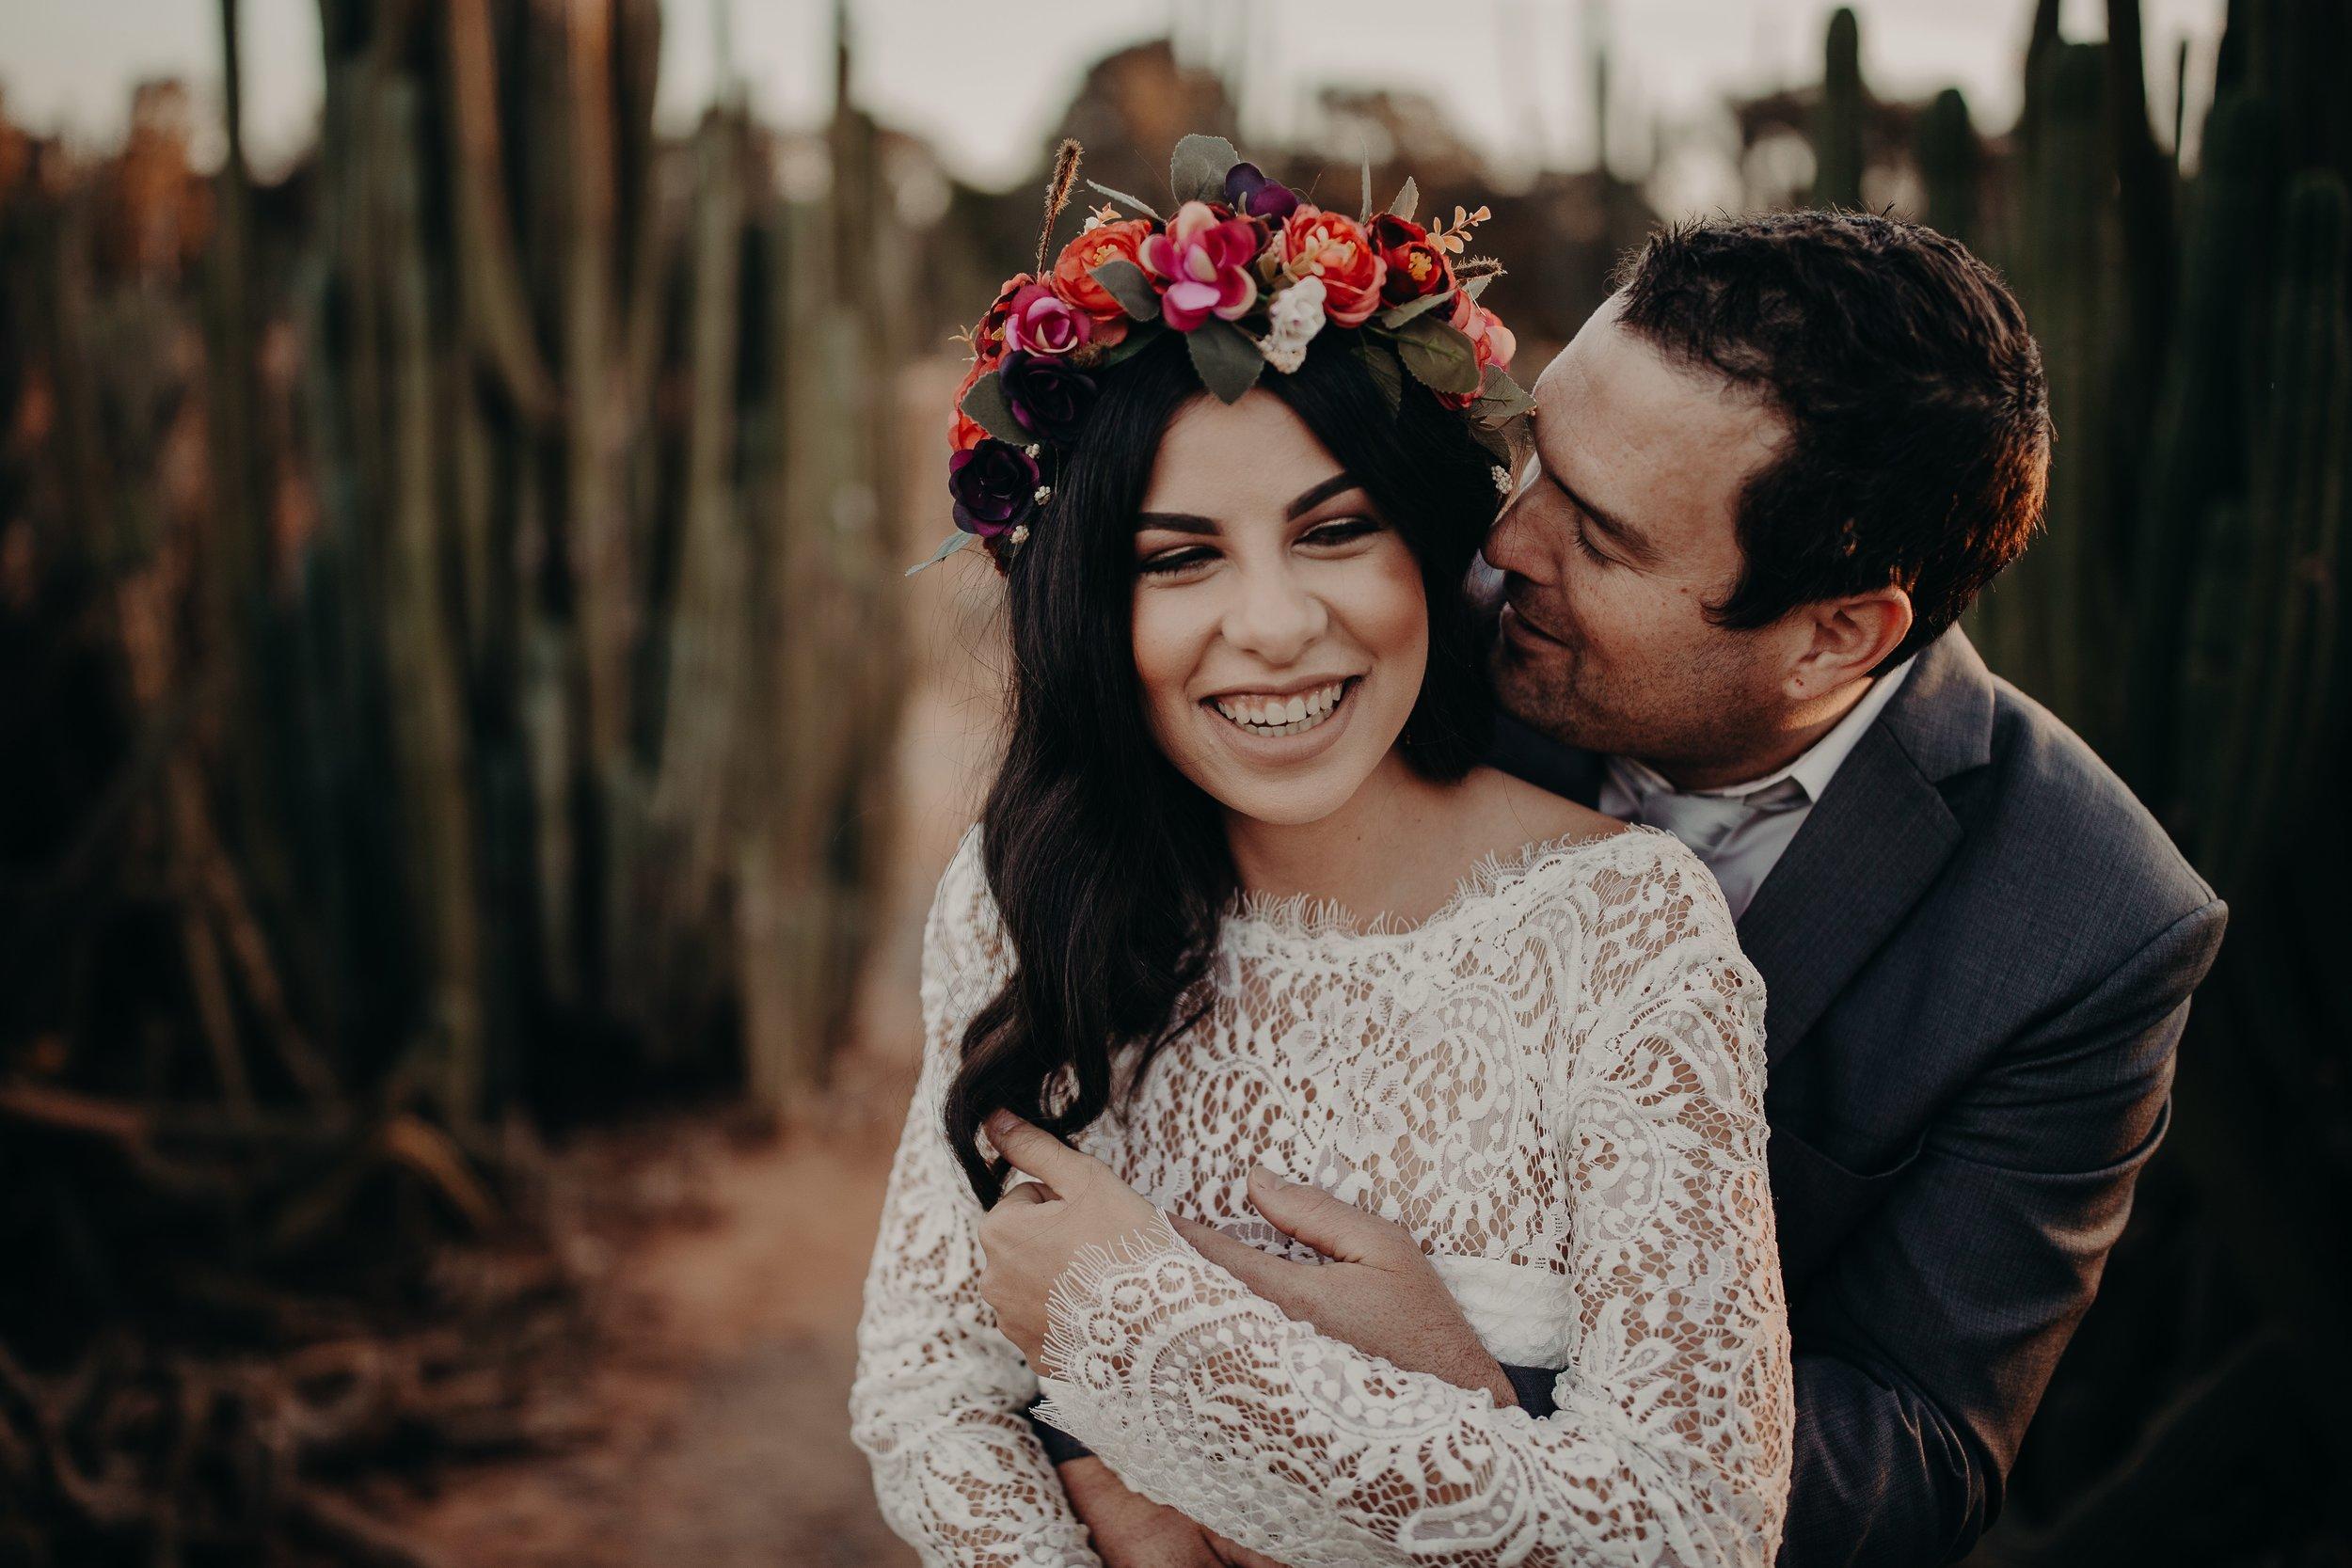 mickalathomas_puremacphotography_weddingphotographer_couplephotographer_Sheppartonphotographer_1460.jpg